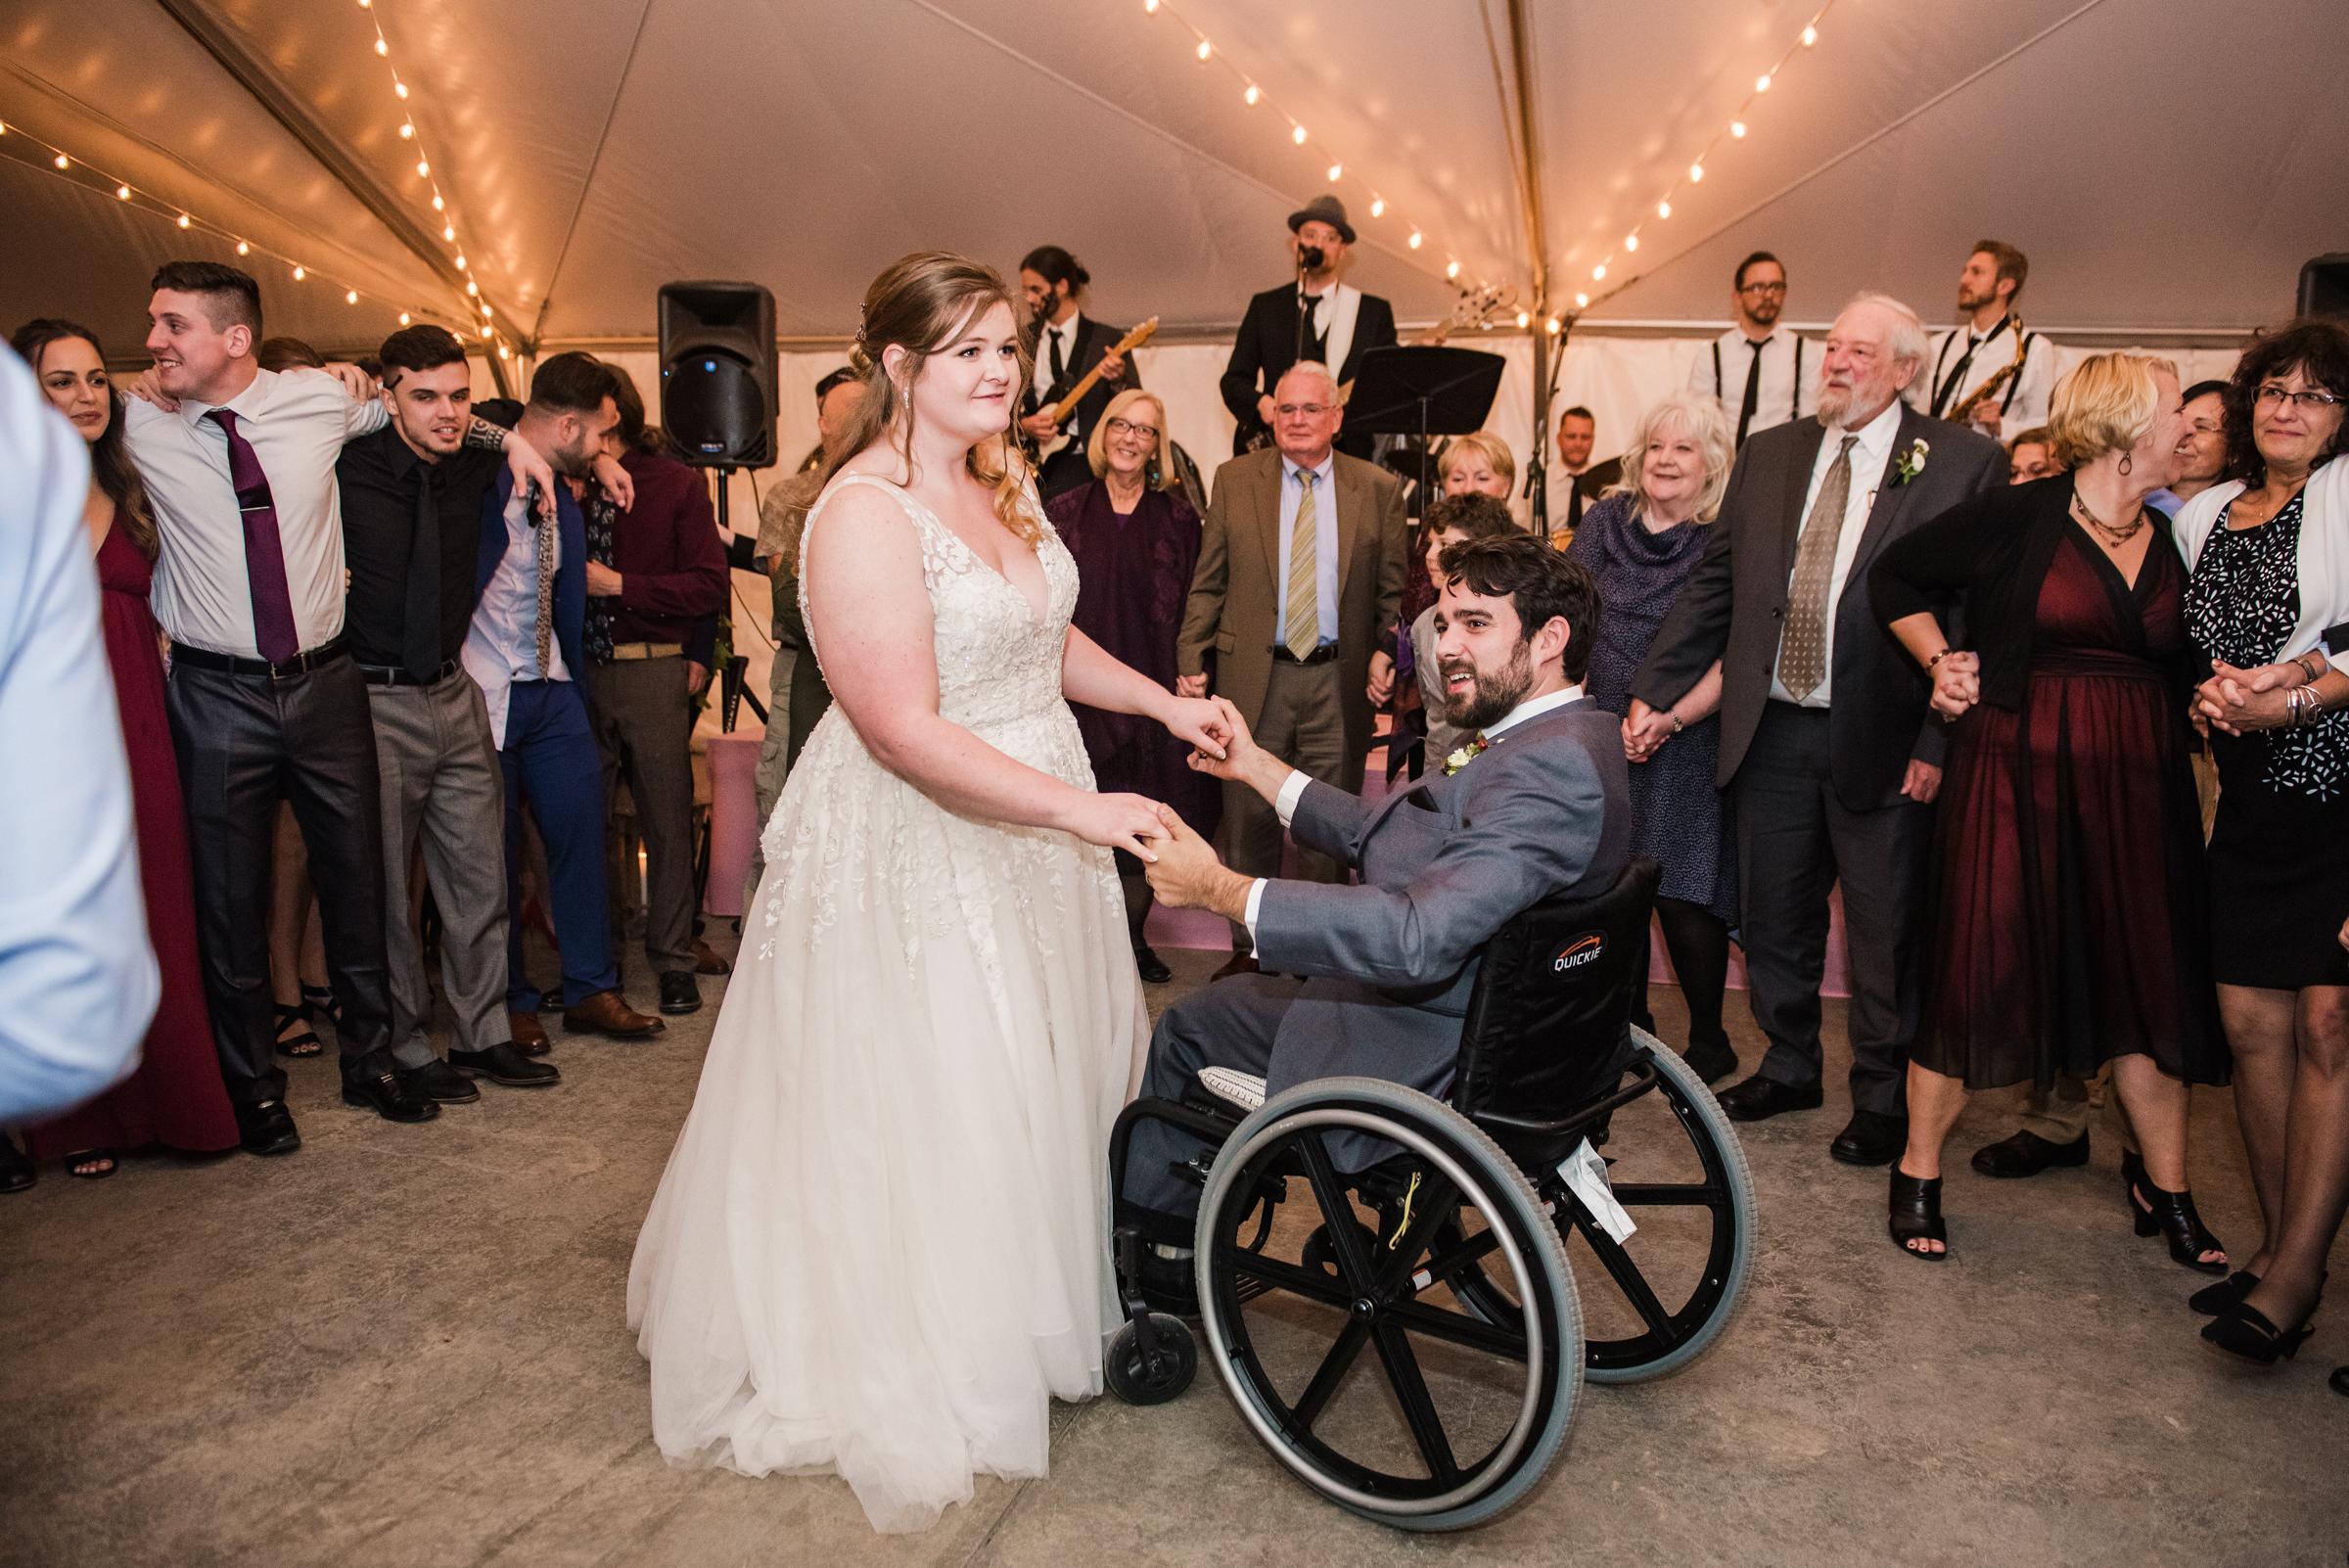 Zugibe_Vineyards_Finger_Lakes_Wedding_JILL_STUDIO_Rochester_NY_Photographer_DSC_4432.jpg